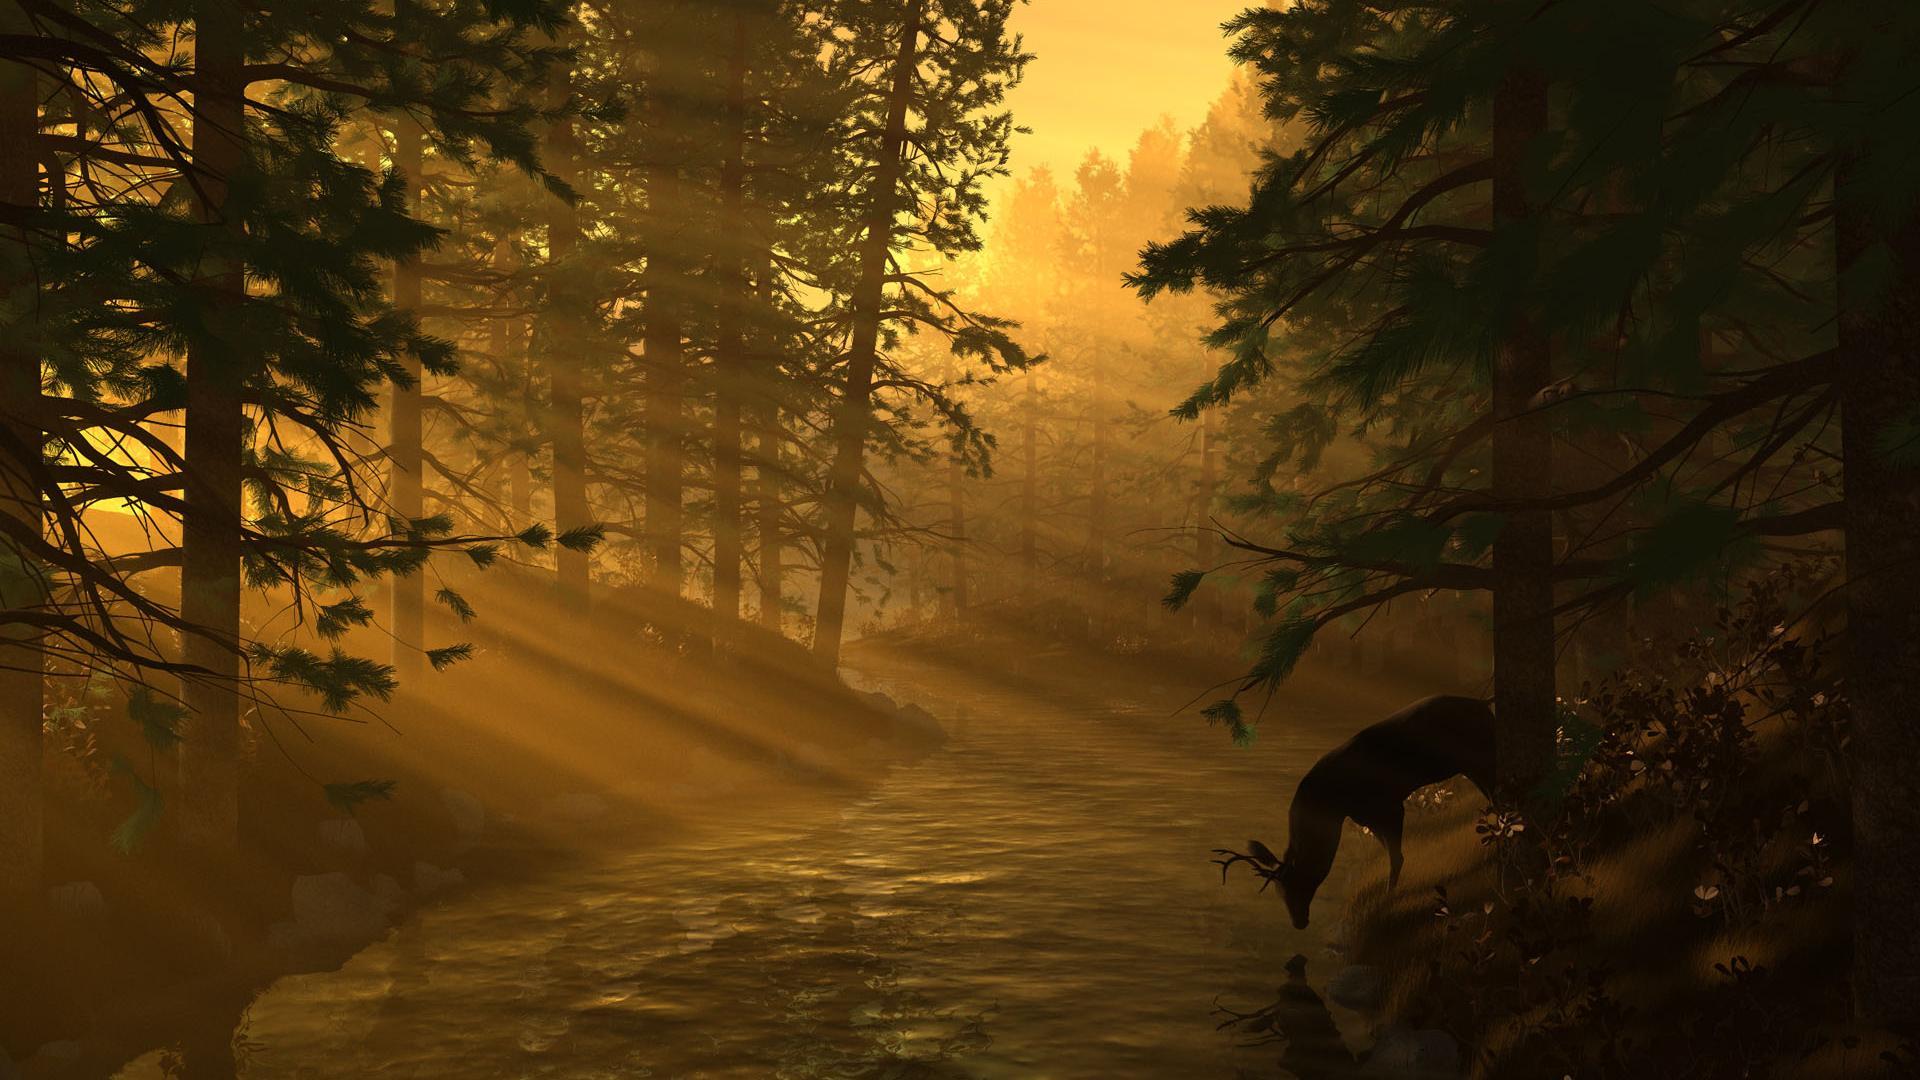 Sunset Nature Wallpaper Backgrounds